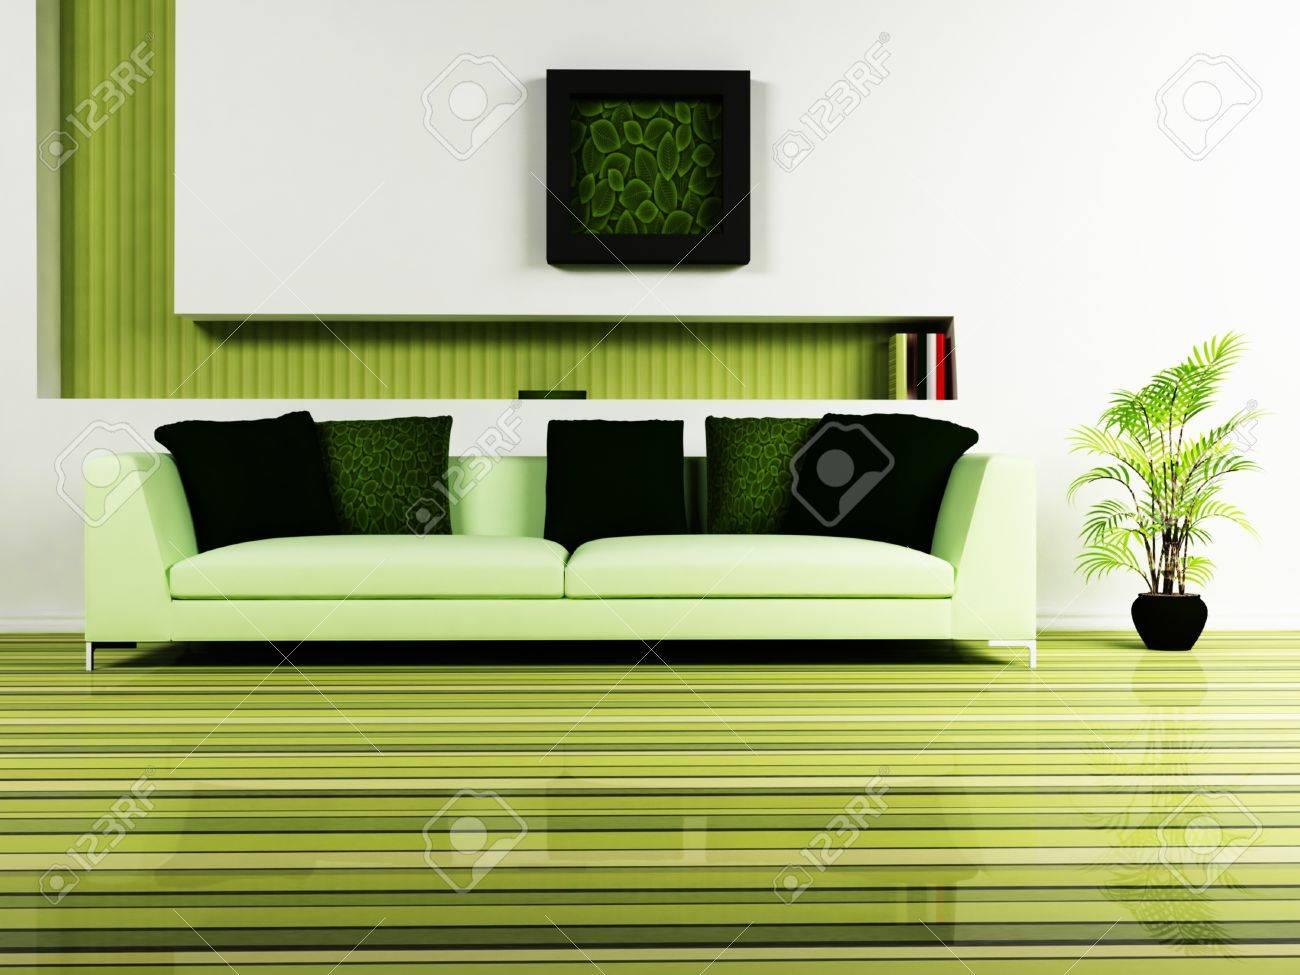 Modern Interior Design Of Living Room With A Nice Sofa, A Plant ...